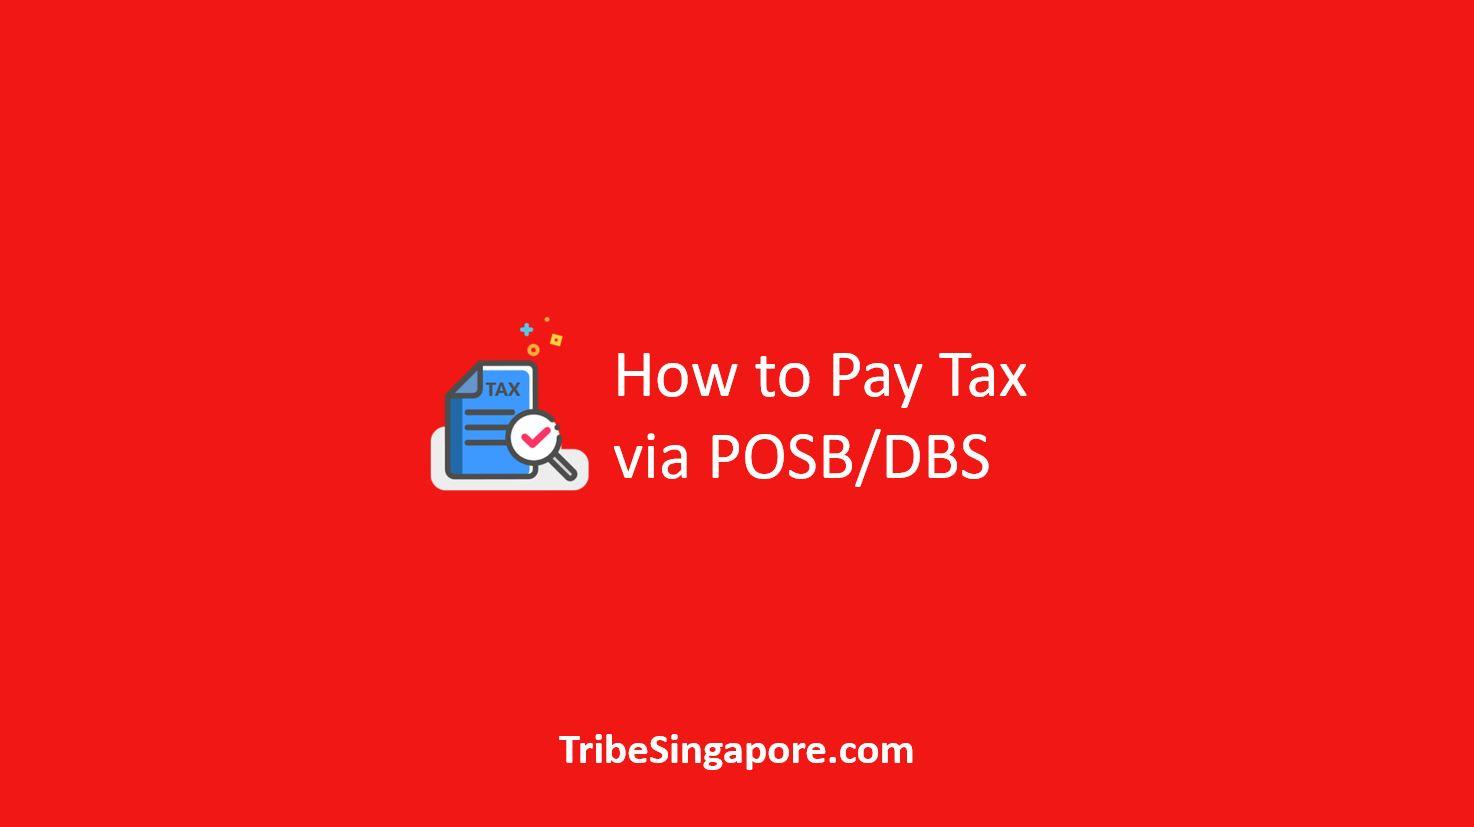 How to Pay Tax via POSB/DBS